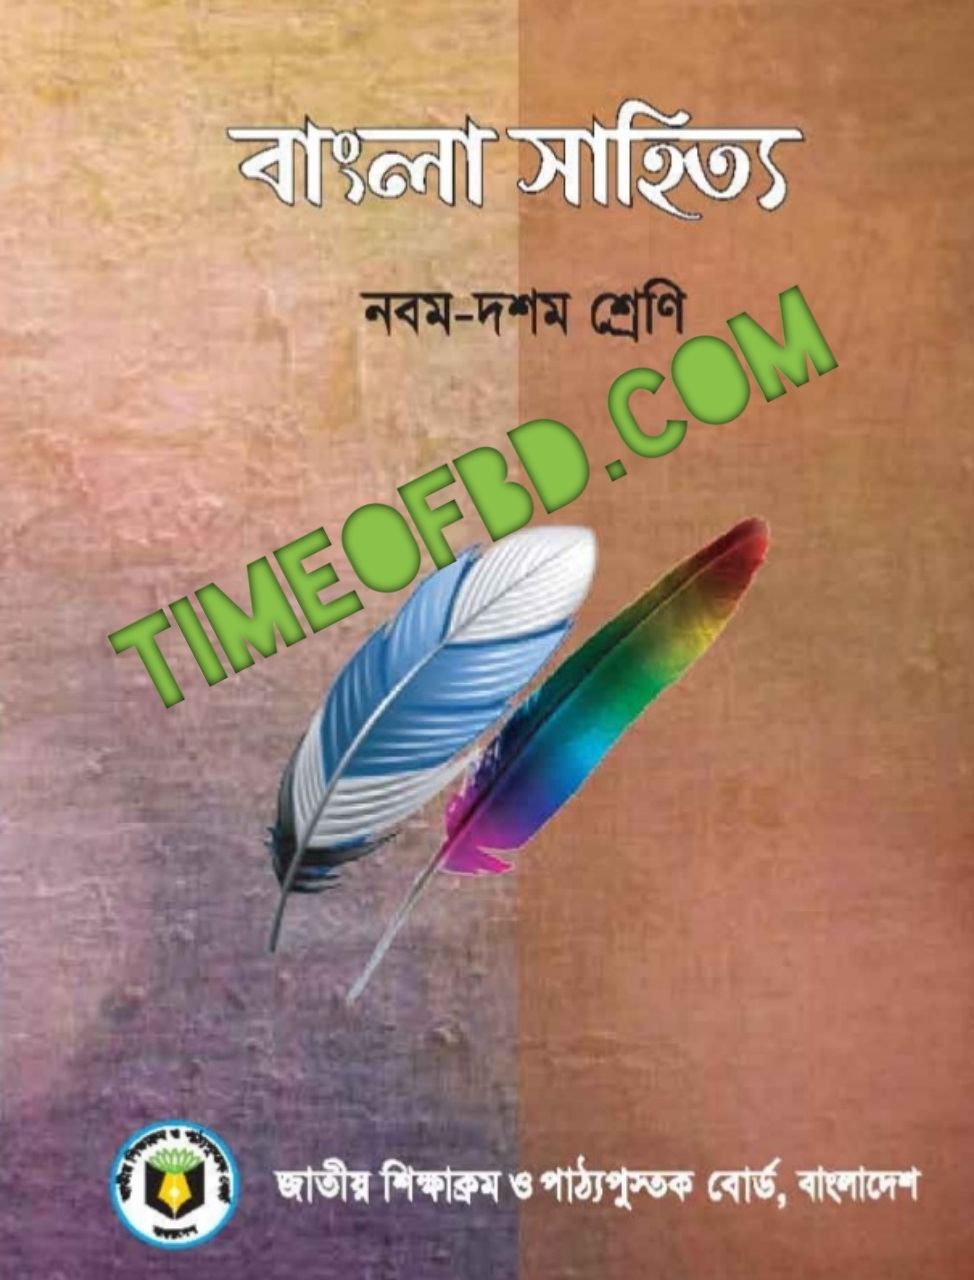 Class 9 bangla book 2021, class 9 bangla book pdf, class 9 bangla question, class 9 bangla boi, class saven bangla book 2021, class 9 bangla book pdf, class 9 bangla book nctb, class 9 bangla guide 2021, class 9 bangla guide pdf, class 9 bangla note book 2021, class 9 bangla book pdf in Bengali, nctb book of class 9, class 9 bangla book solution, class 9 guide book pdf, class 9 guide book pdf 2021, বাংলা বই class 9, বাংলা বই pdf, বাংলা বই নবম শ্রেণির, নবম শ্রেণীর বাংলা বই ডাউনলোড, বাংলা বই নবম শ্রেণি, নবম শ্রেণির বাংলা বই ২০২১, নবম শ্রেণীর বাংলা বই পিডিএফ, নবম শ্রেণির বাংলা বই pdf 2021, নবম শ্রেণীর বাংলা গাইড, নবম শ্রেণীর বাংলা গাইড পিডিএফ, নবম শ্রেণীর বাংলা গাইড pdf 2021, নবম শ্রেণীর বাংলা বই গাইড, নবম শ্রেণীর বাংলা গাইড ডাউনলোড, আমার বাংলা বই নবম শ্রেণি,